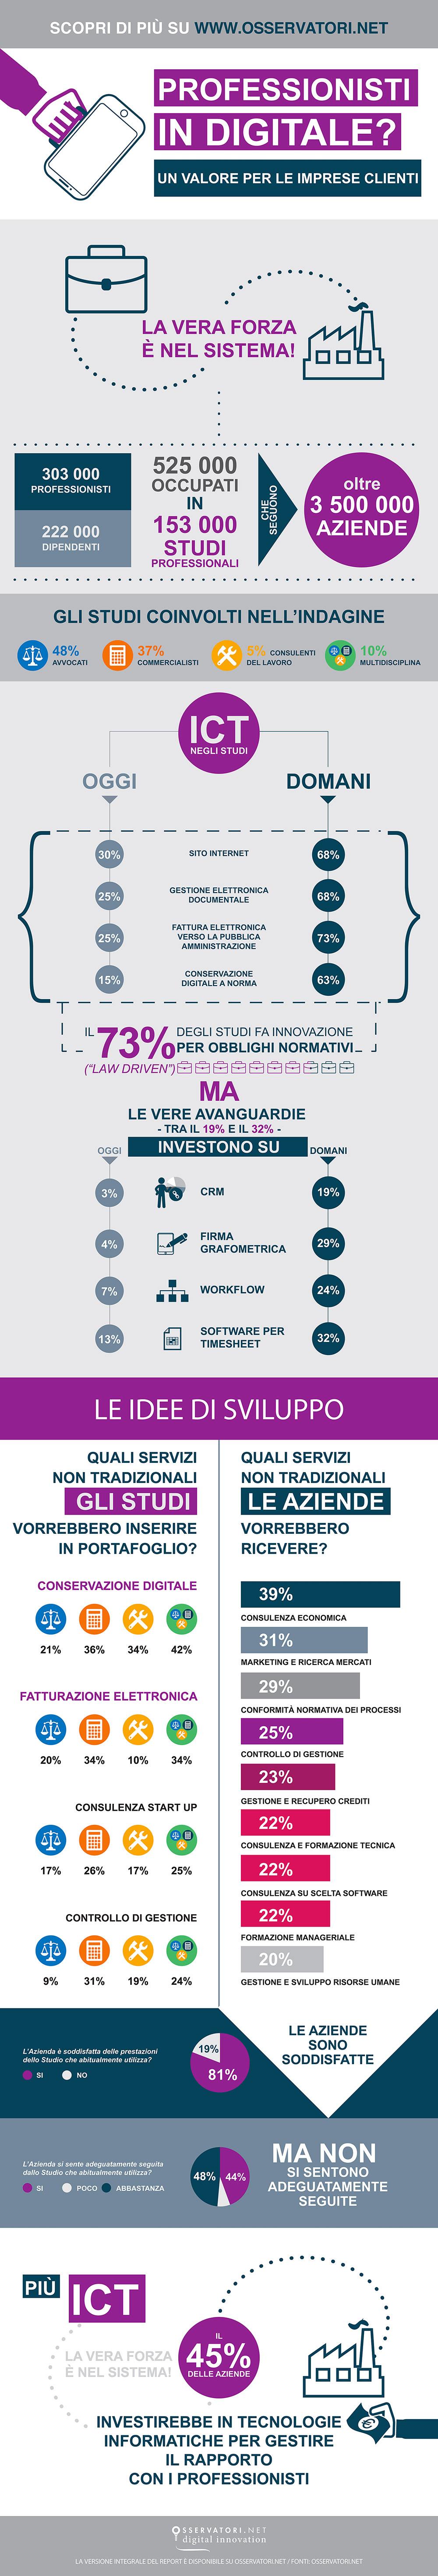 ict professionisti - infografica